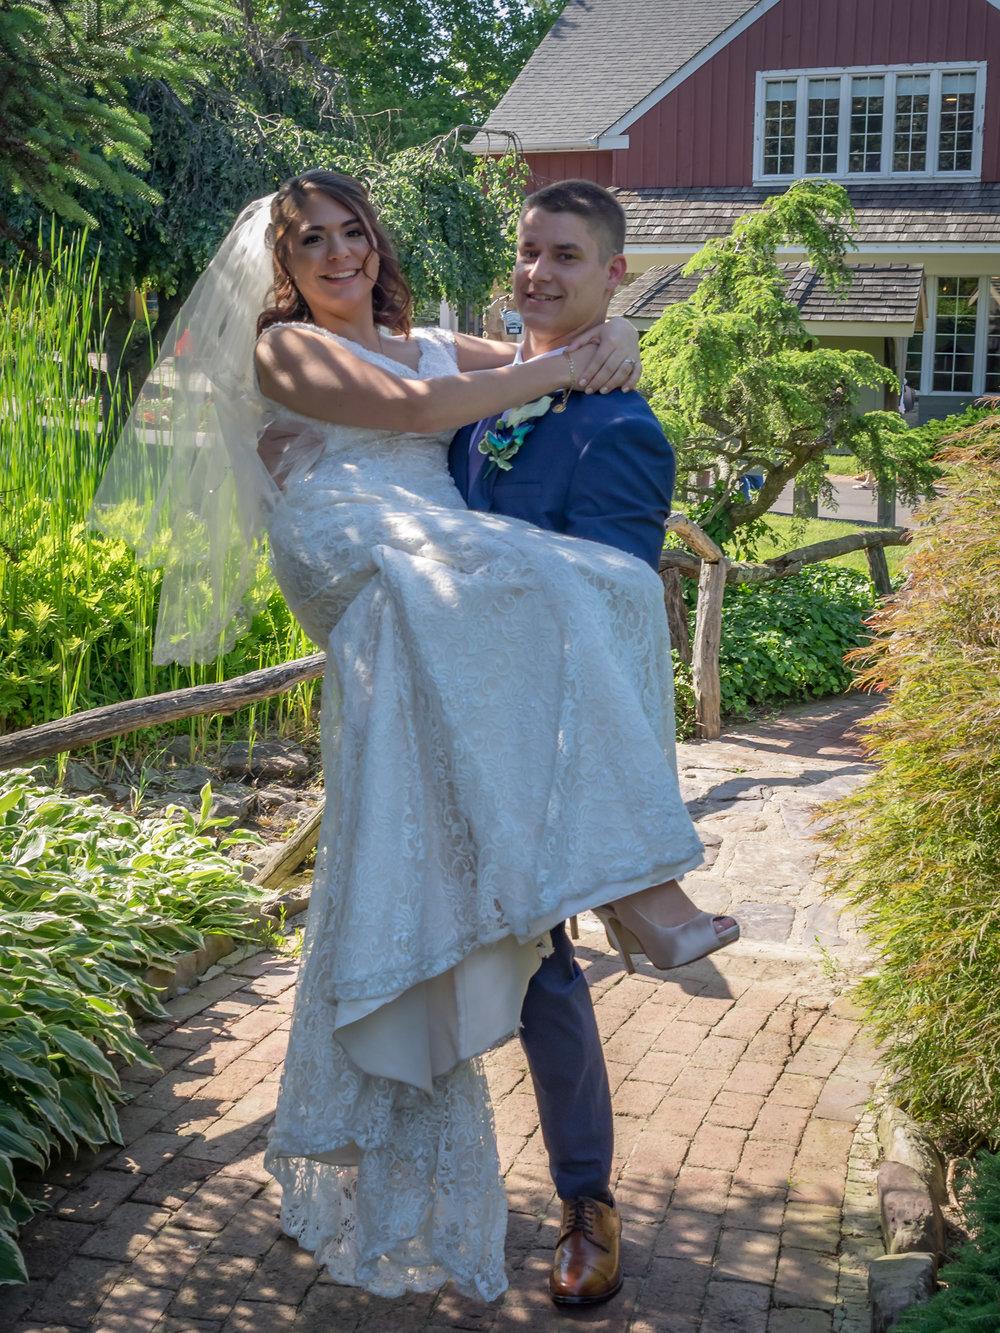 14 - Haines Couple - 20180616 - Haines -67502.jpg